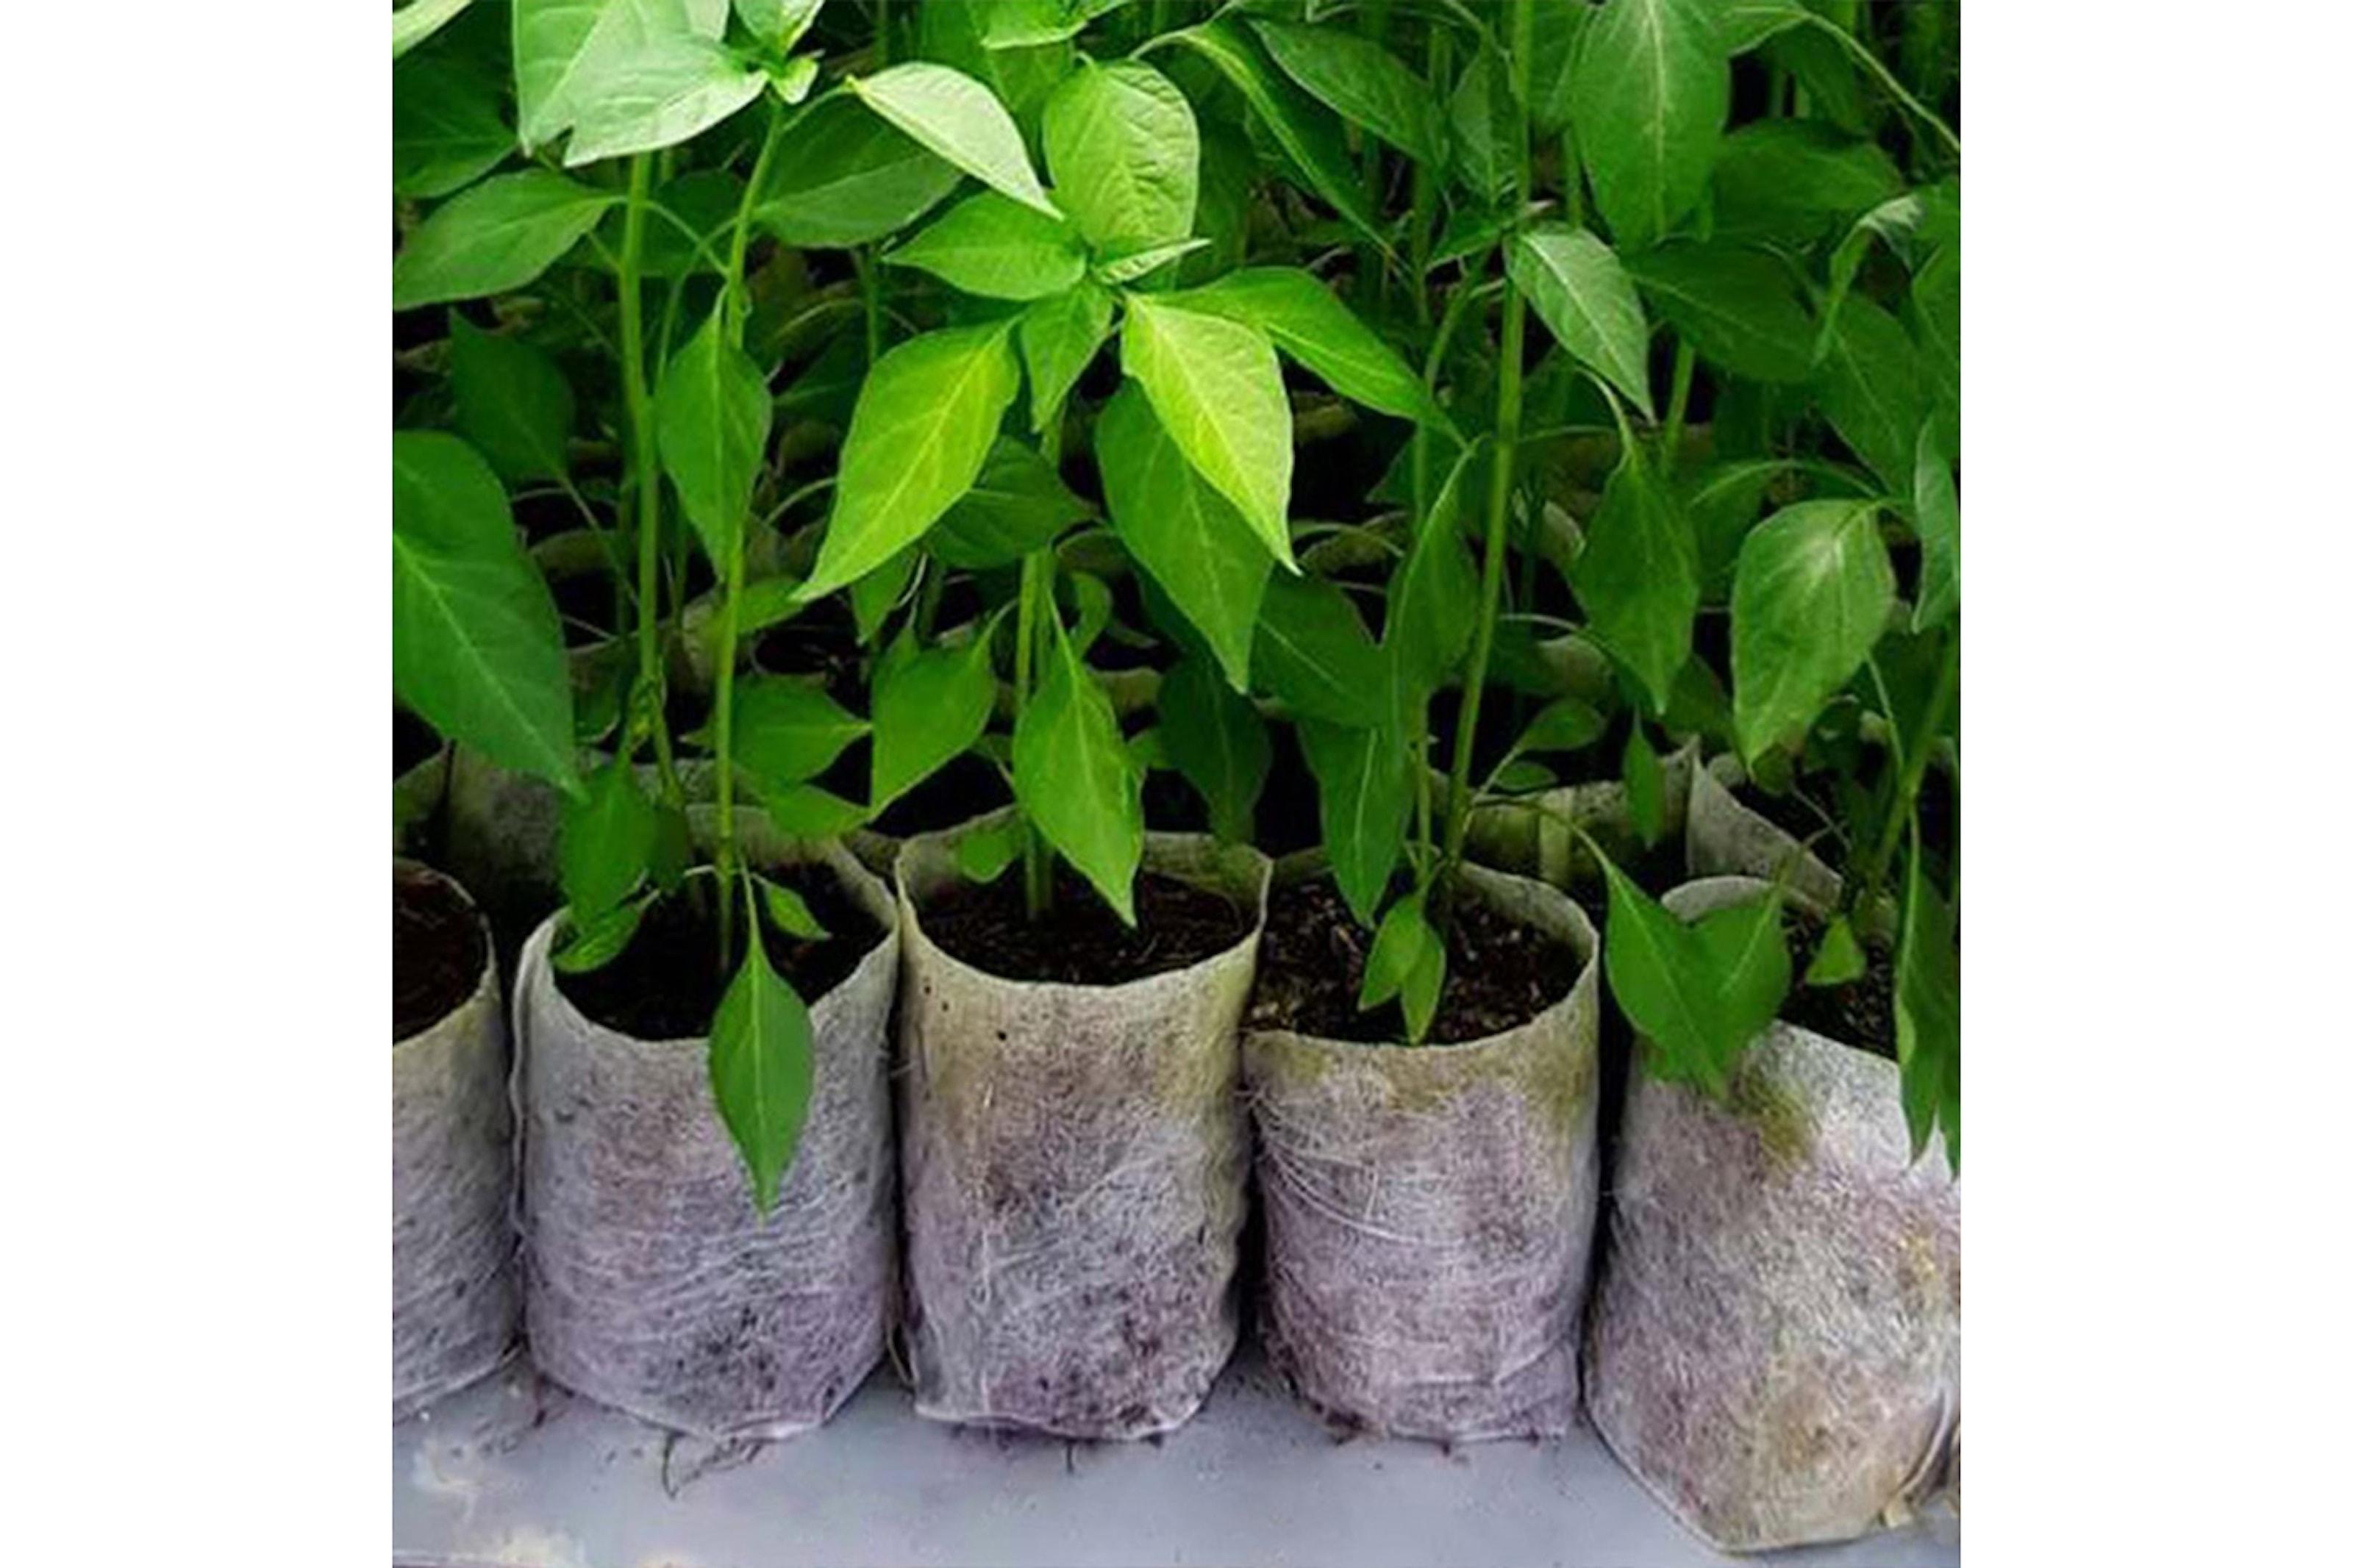 Nedbrytbara odlingspåsar, 100-pack